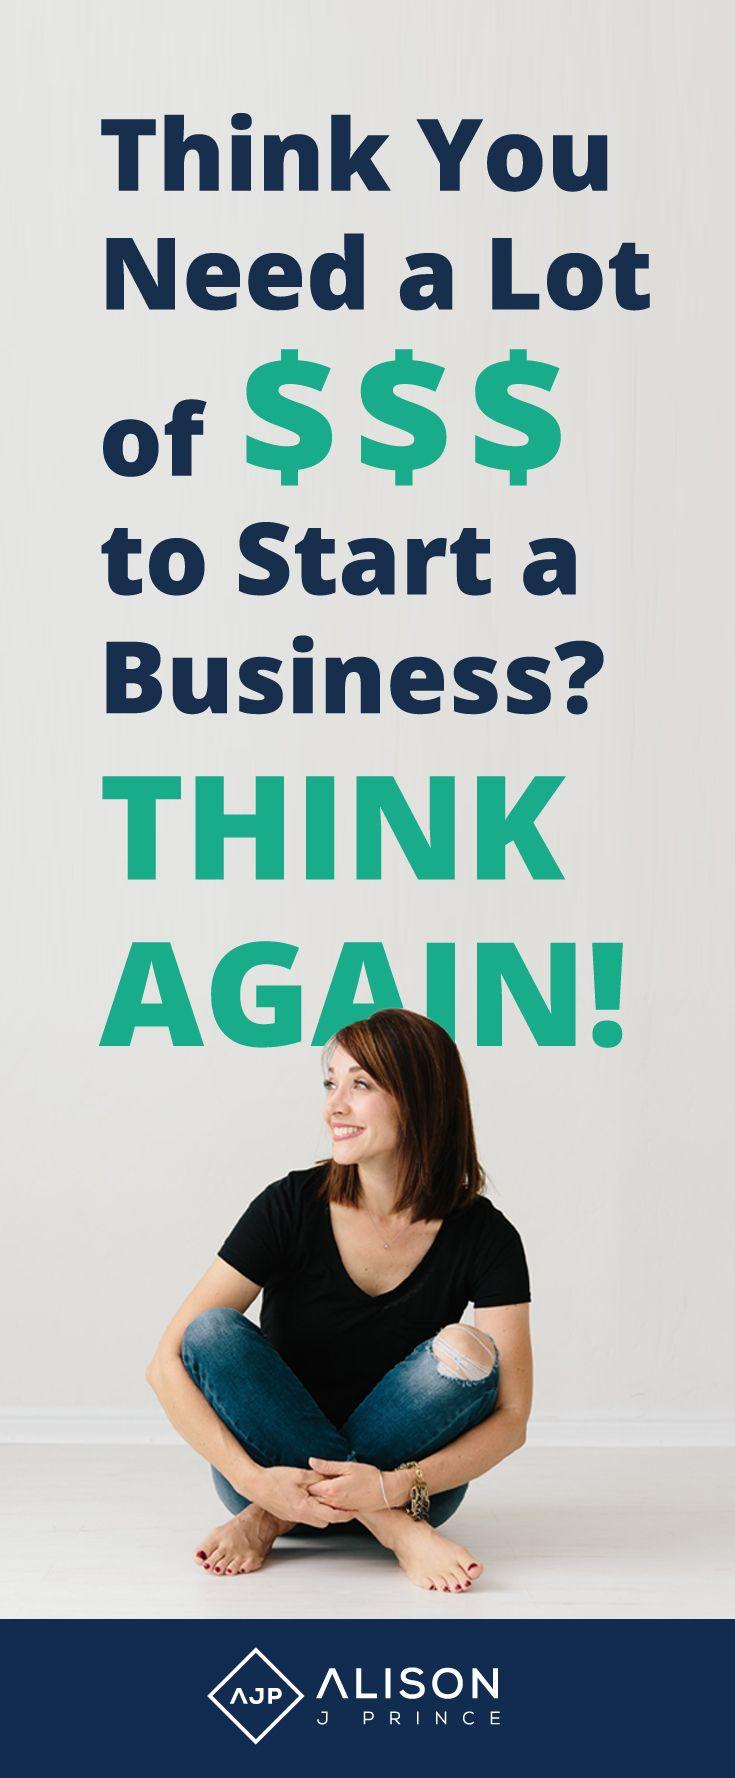 Money To Start An Online Business How Much Do You Need Online Business Business Tips Business